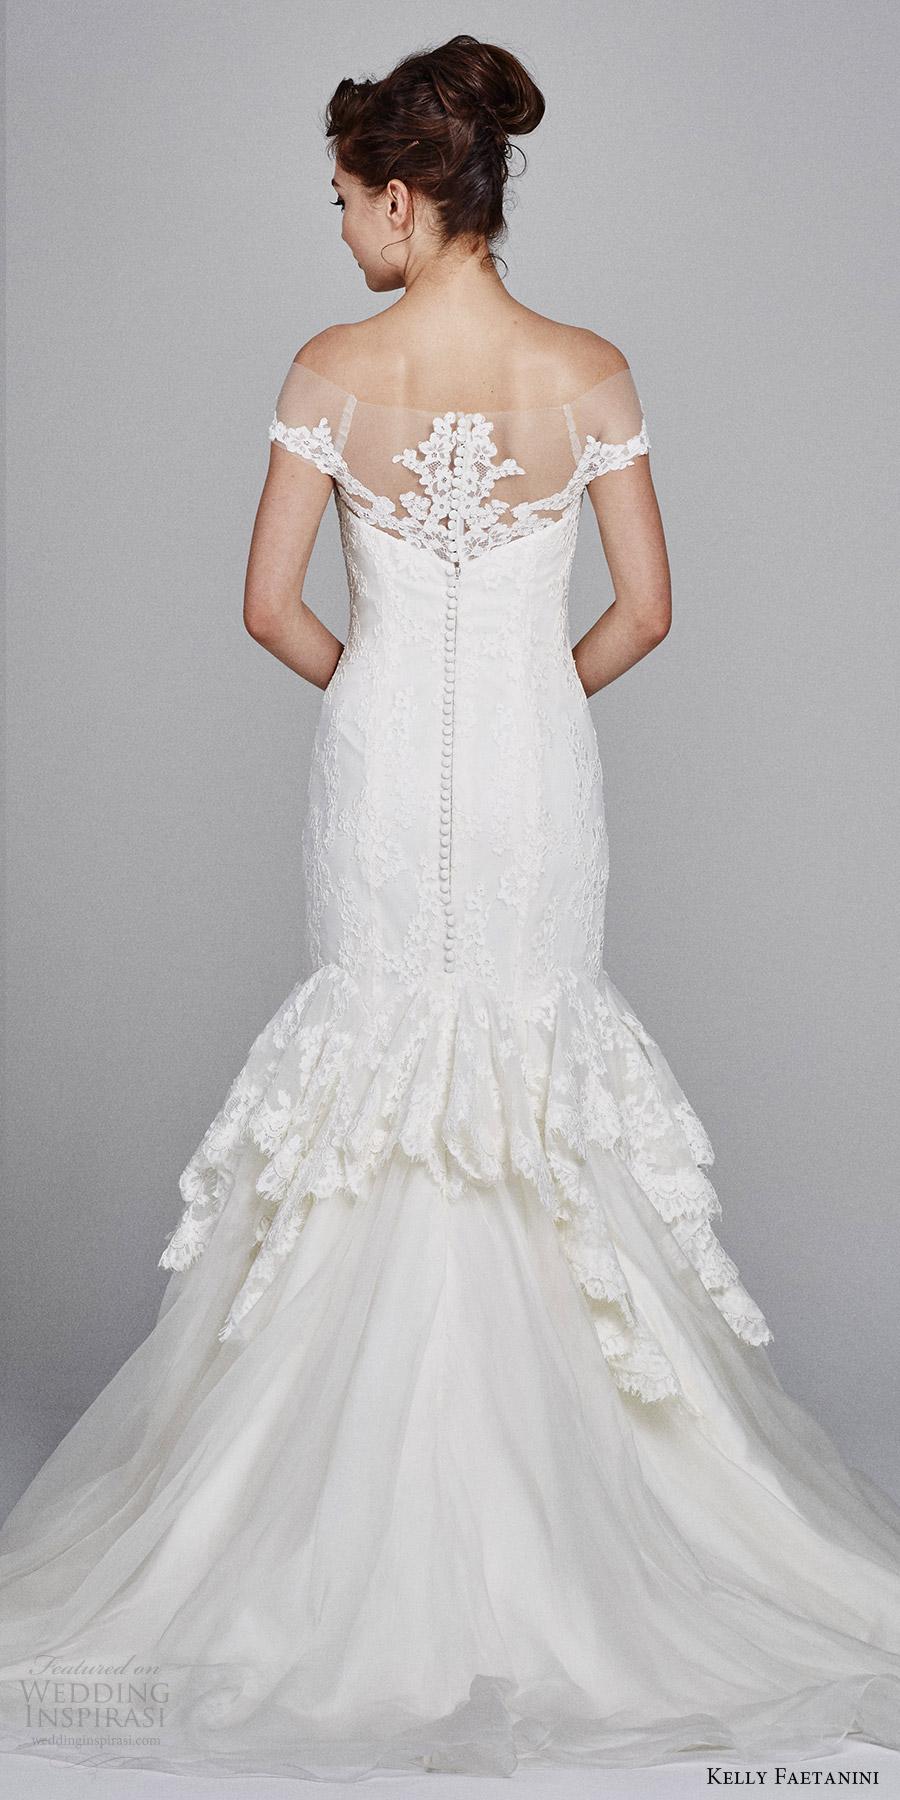 Mermaid Sweetheart Lace Wedding Dress 39 Superb kelly faetanini bridal fall